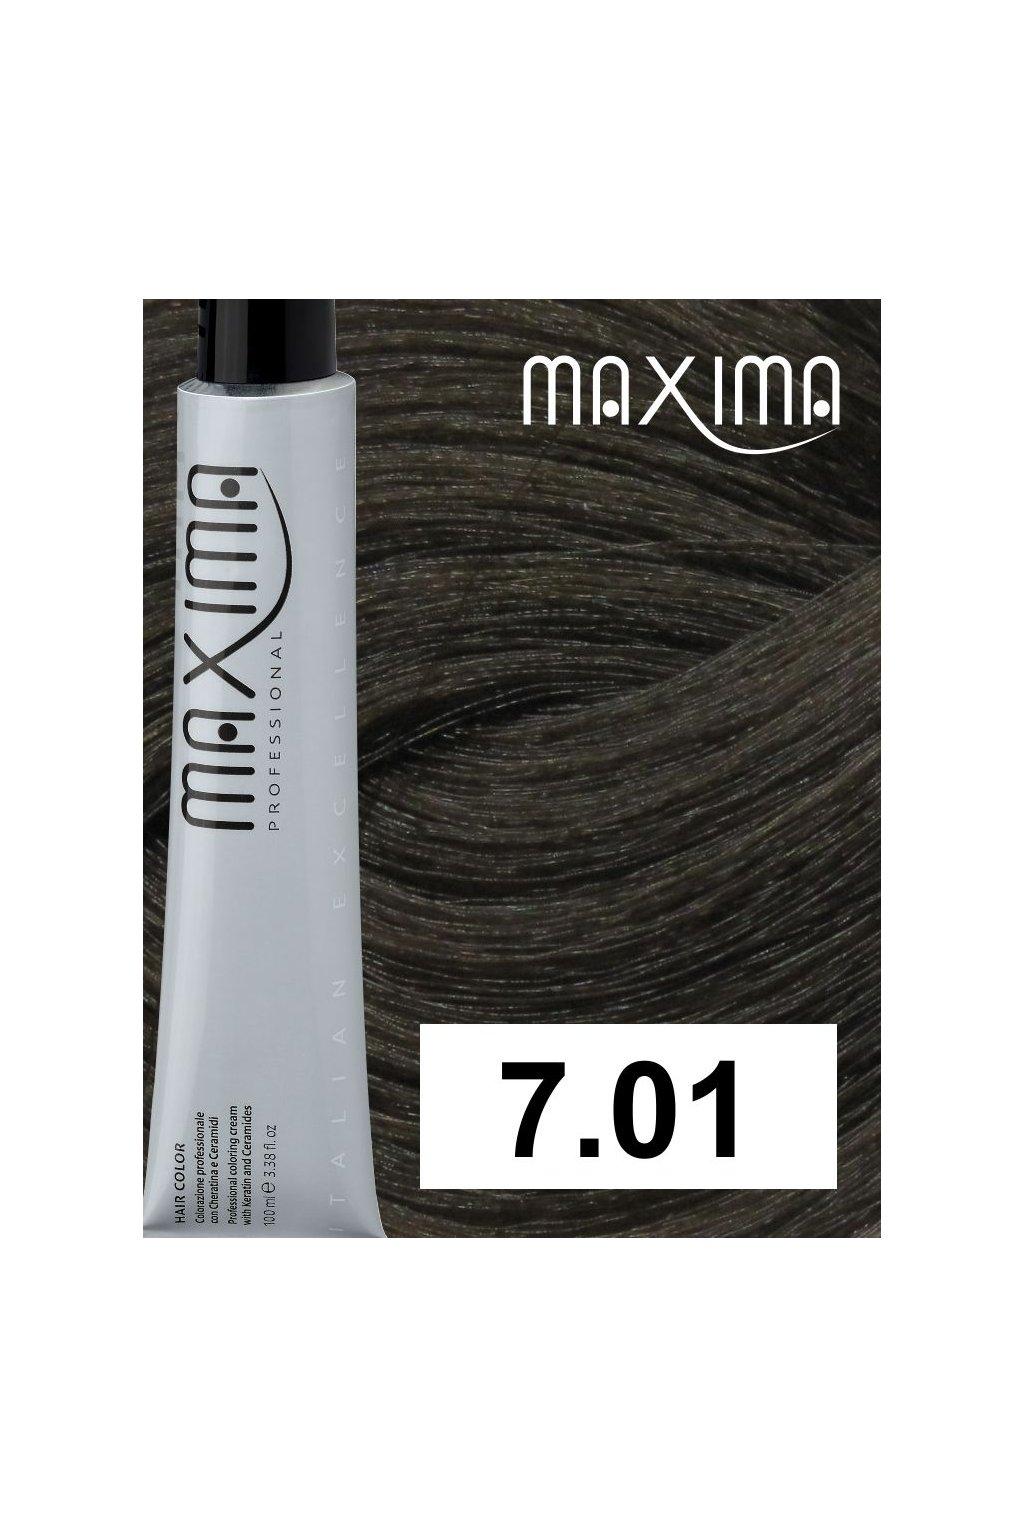 7 01 max